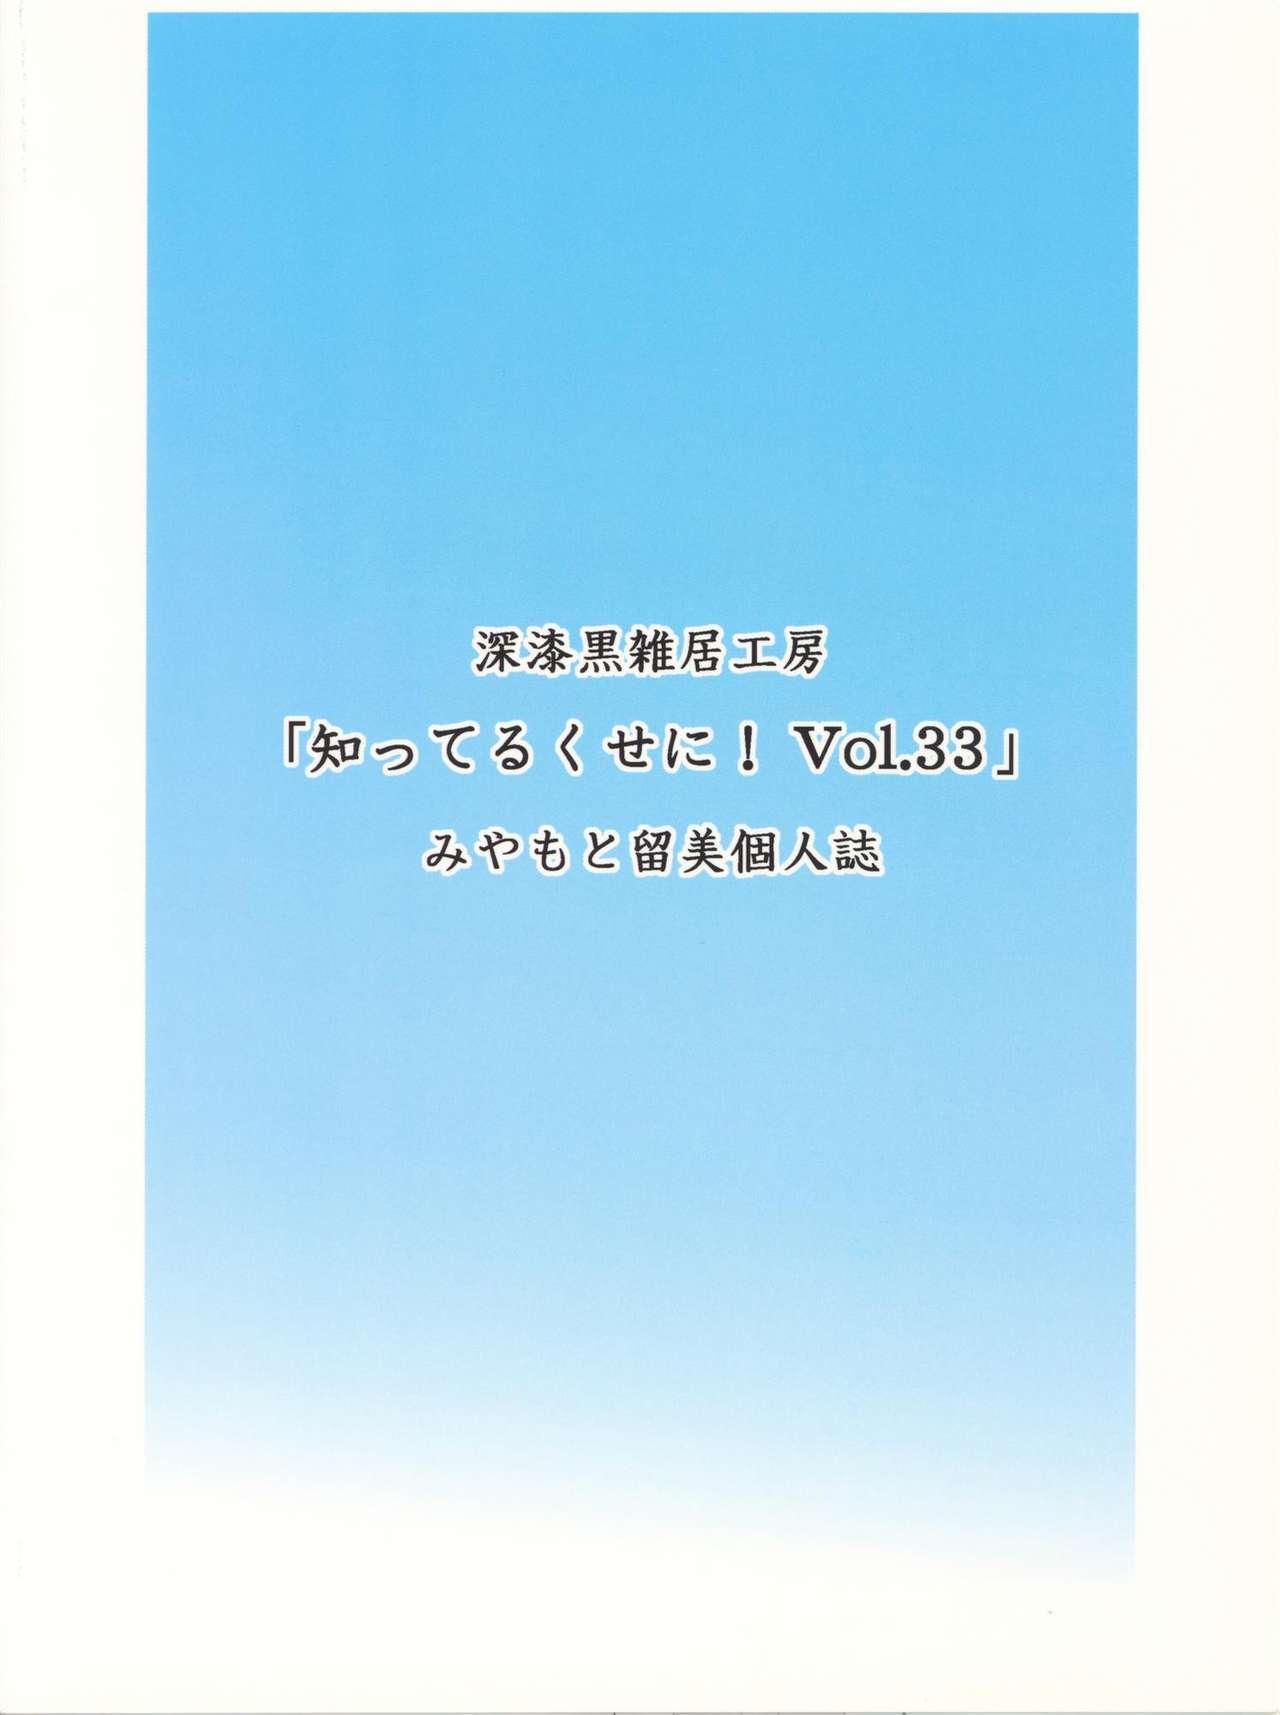 Shitteru Kuse ni! Vol. 33 25